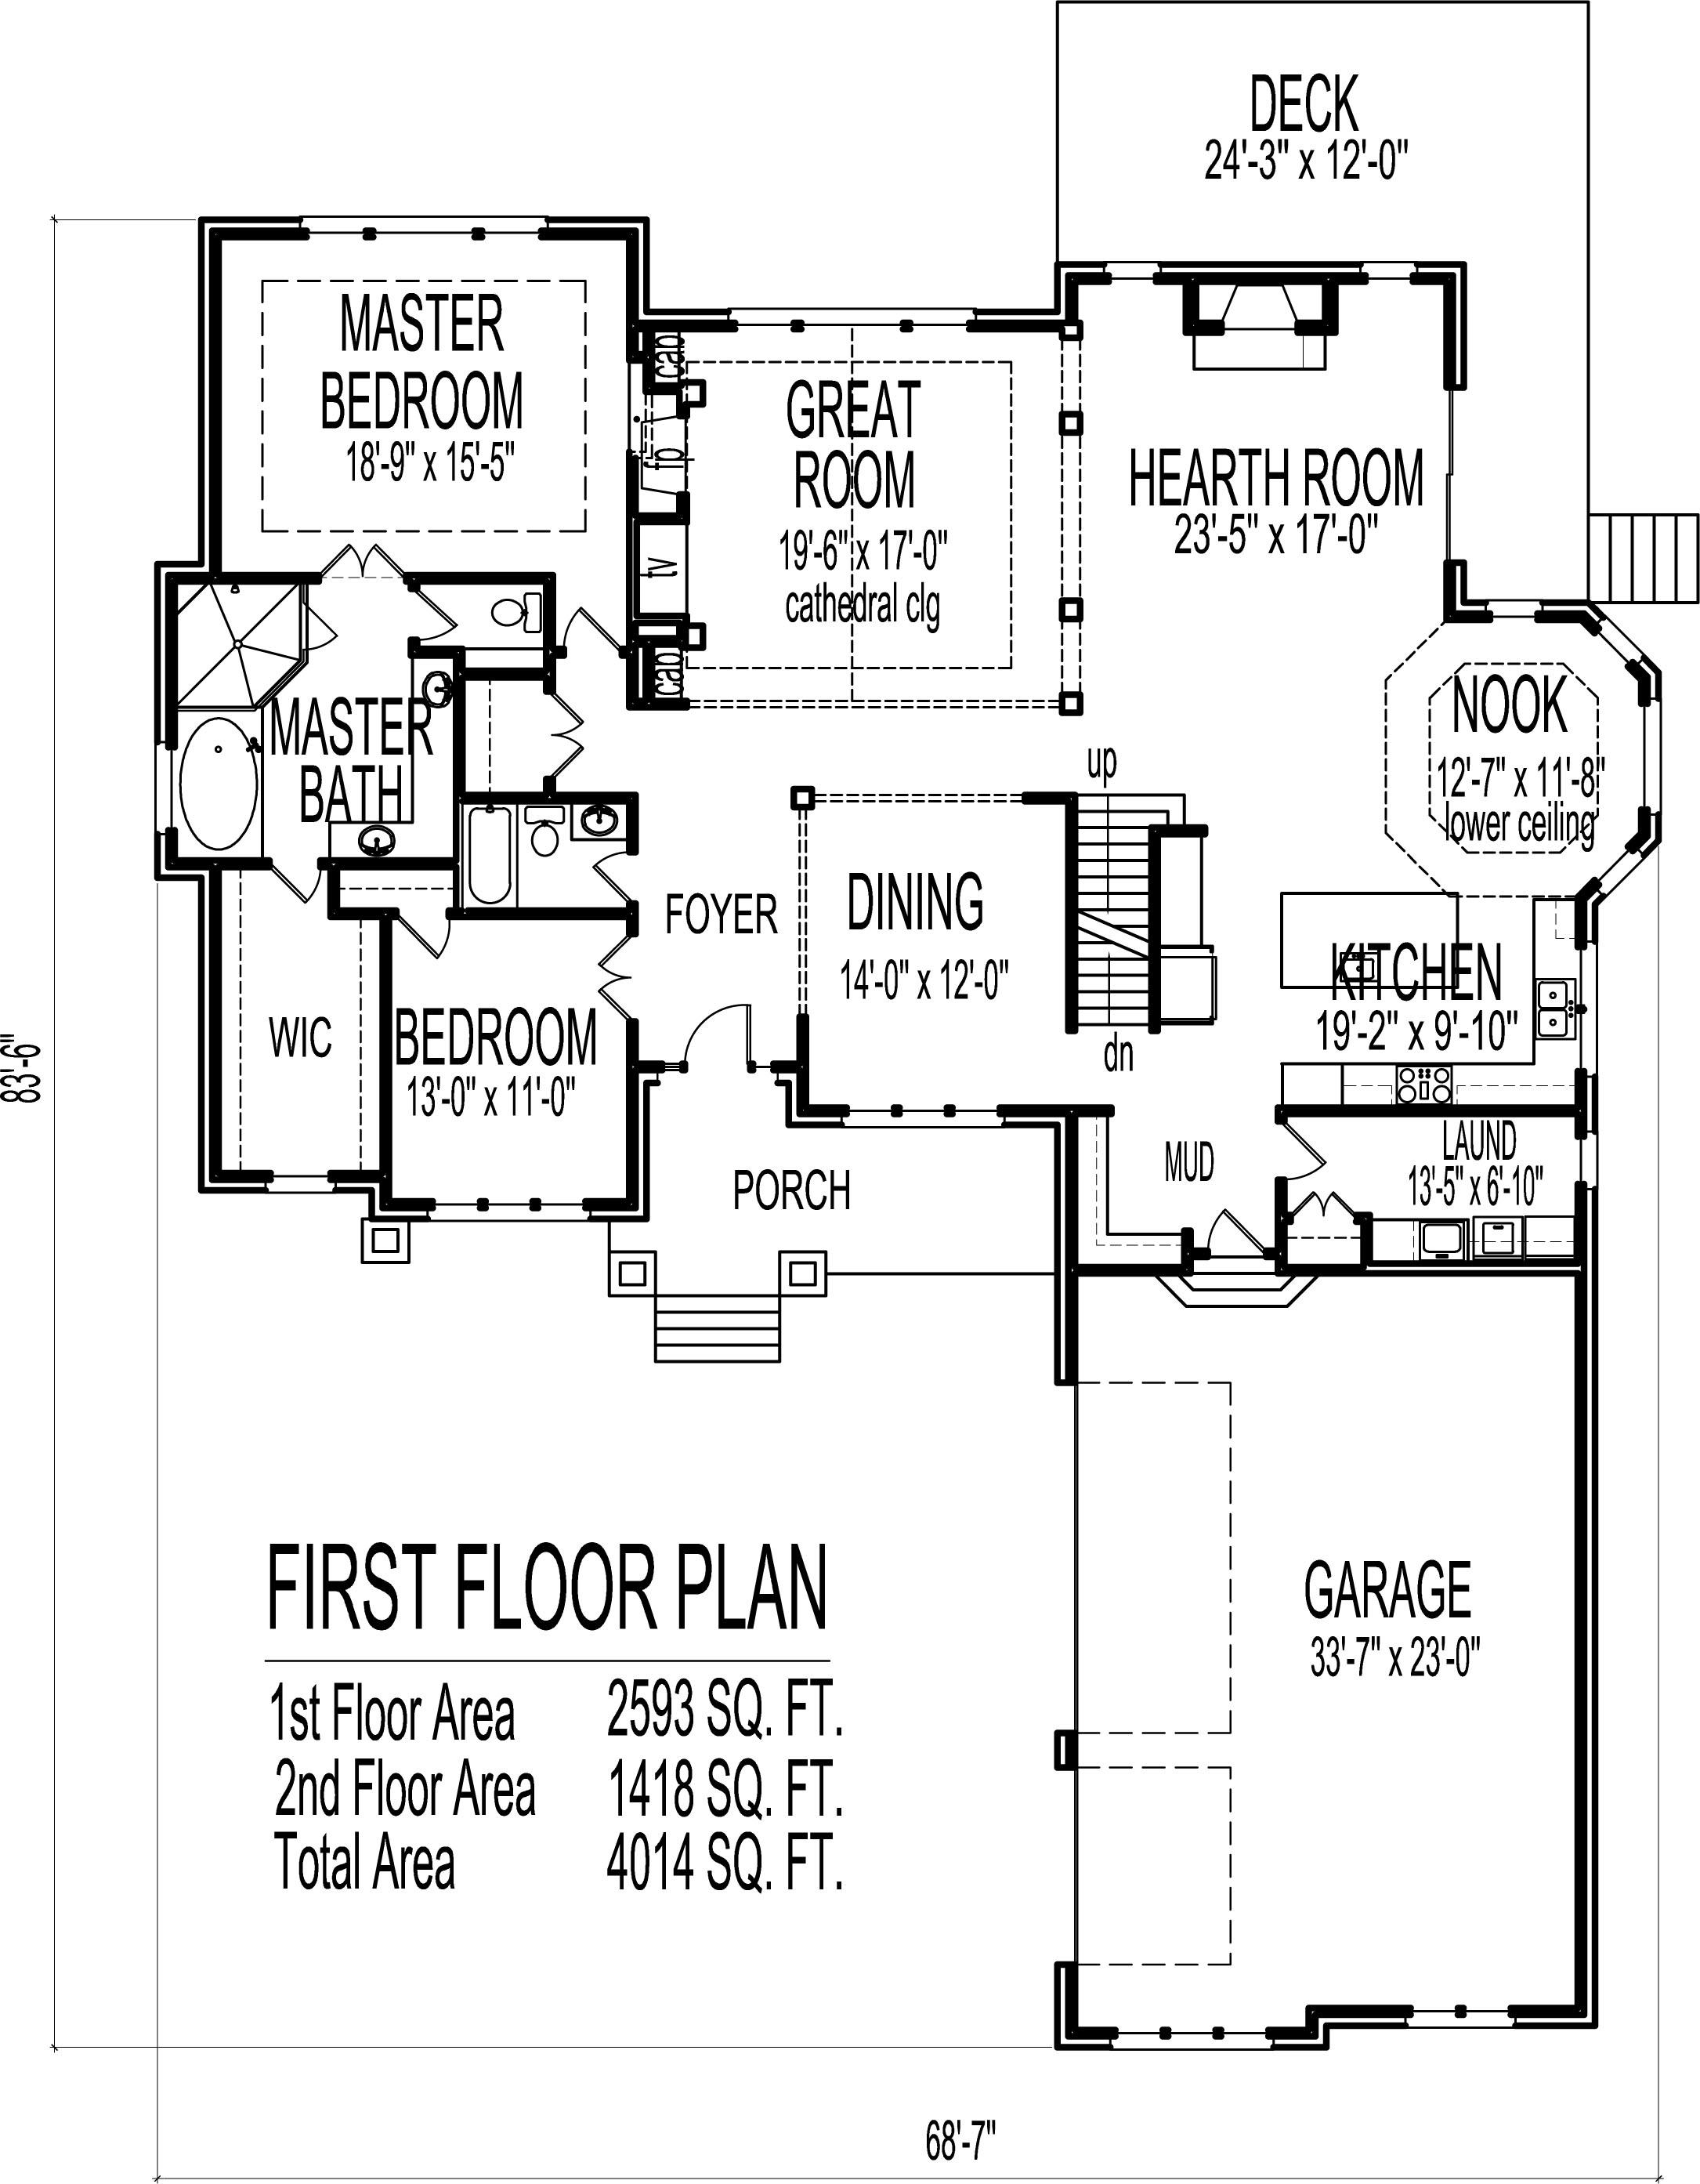 2 Story House Floor Plans 6 Bedroom Craftsman Home Design